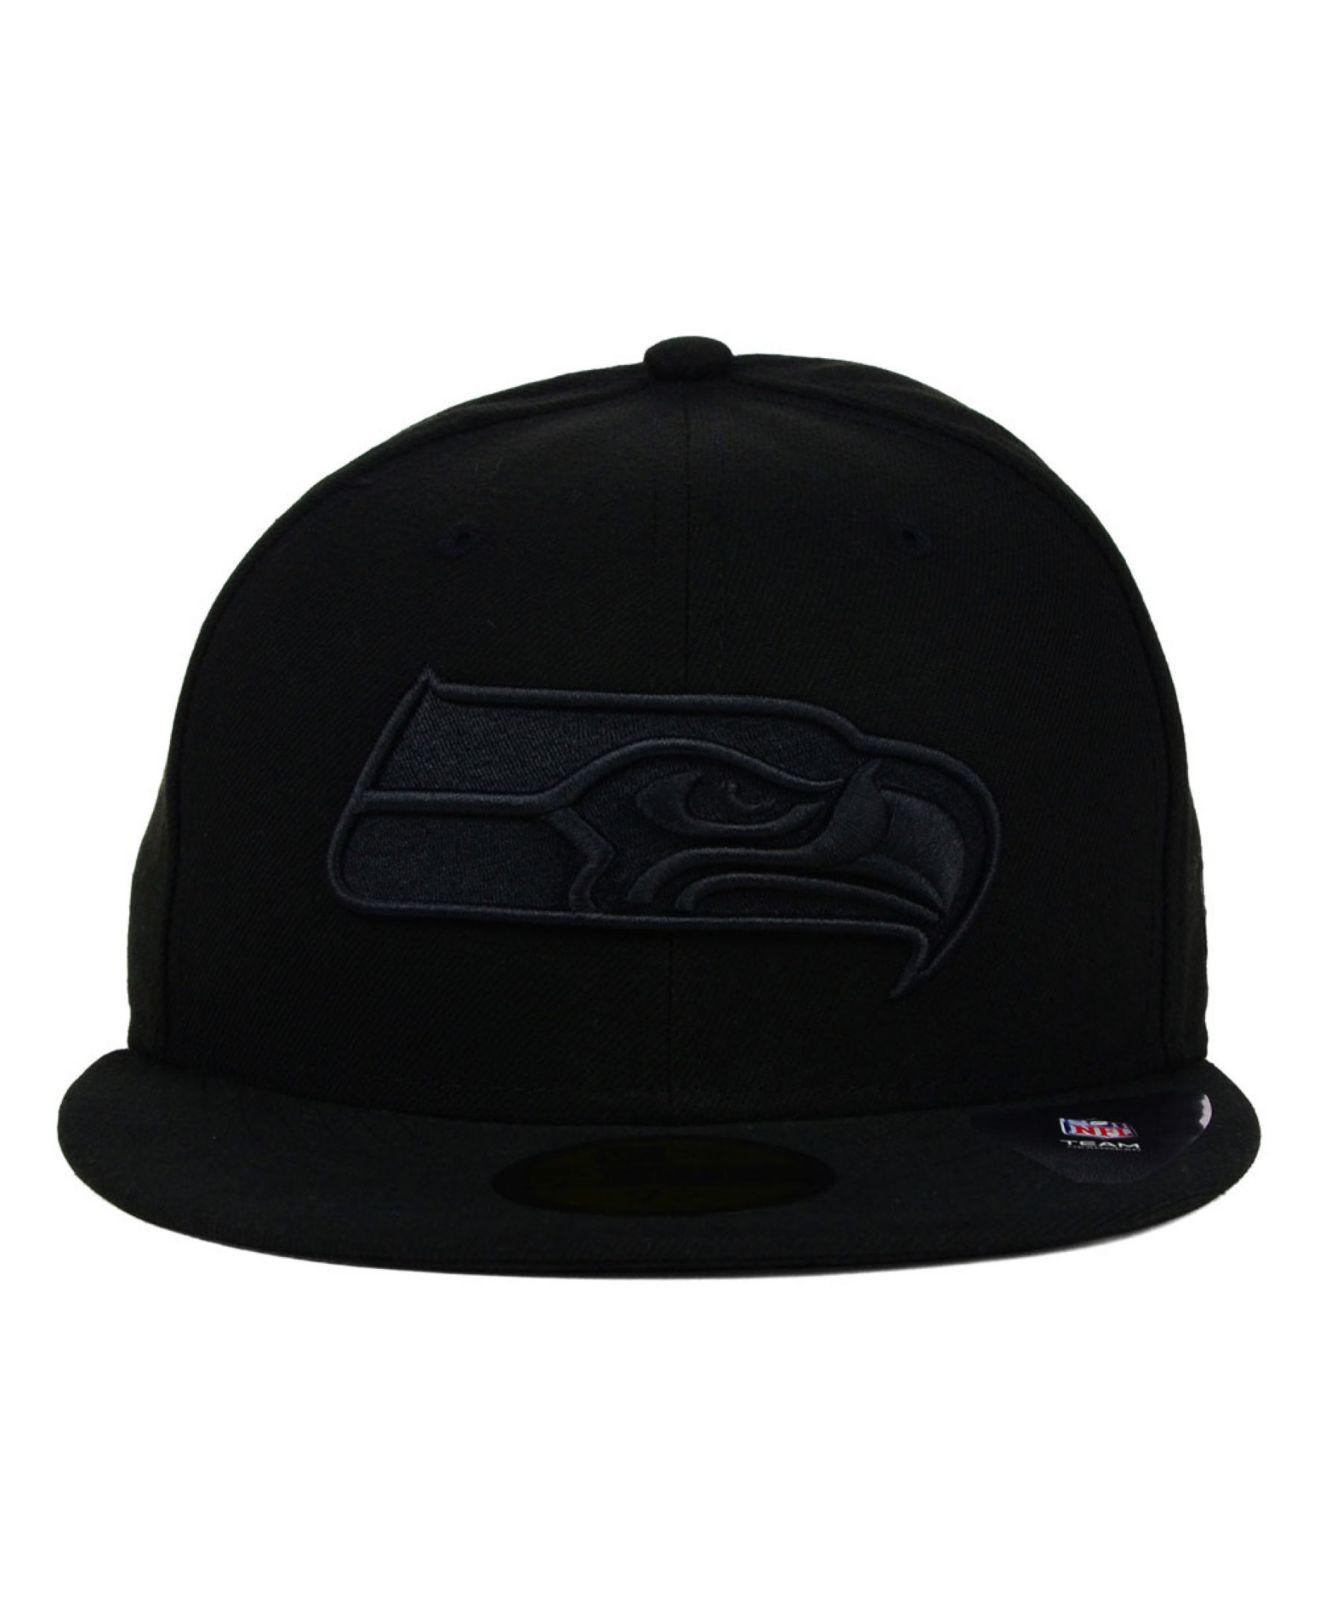 check out ec5b4 4ffba ... release date lyst ktz seattle seahawks black on black 59fifty cap in  black for men 1198d